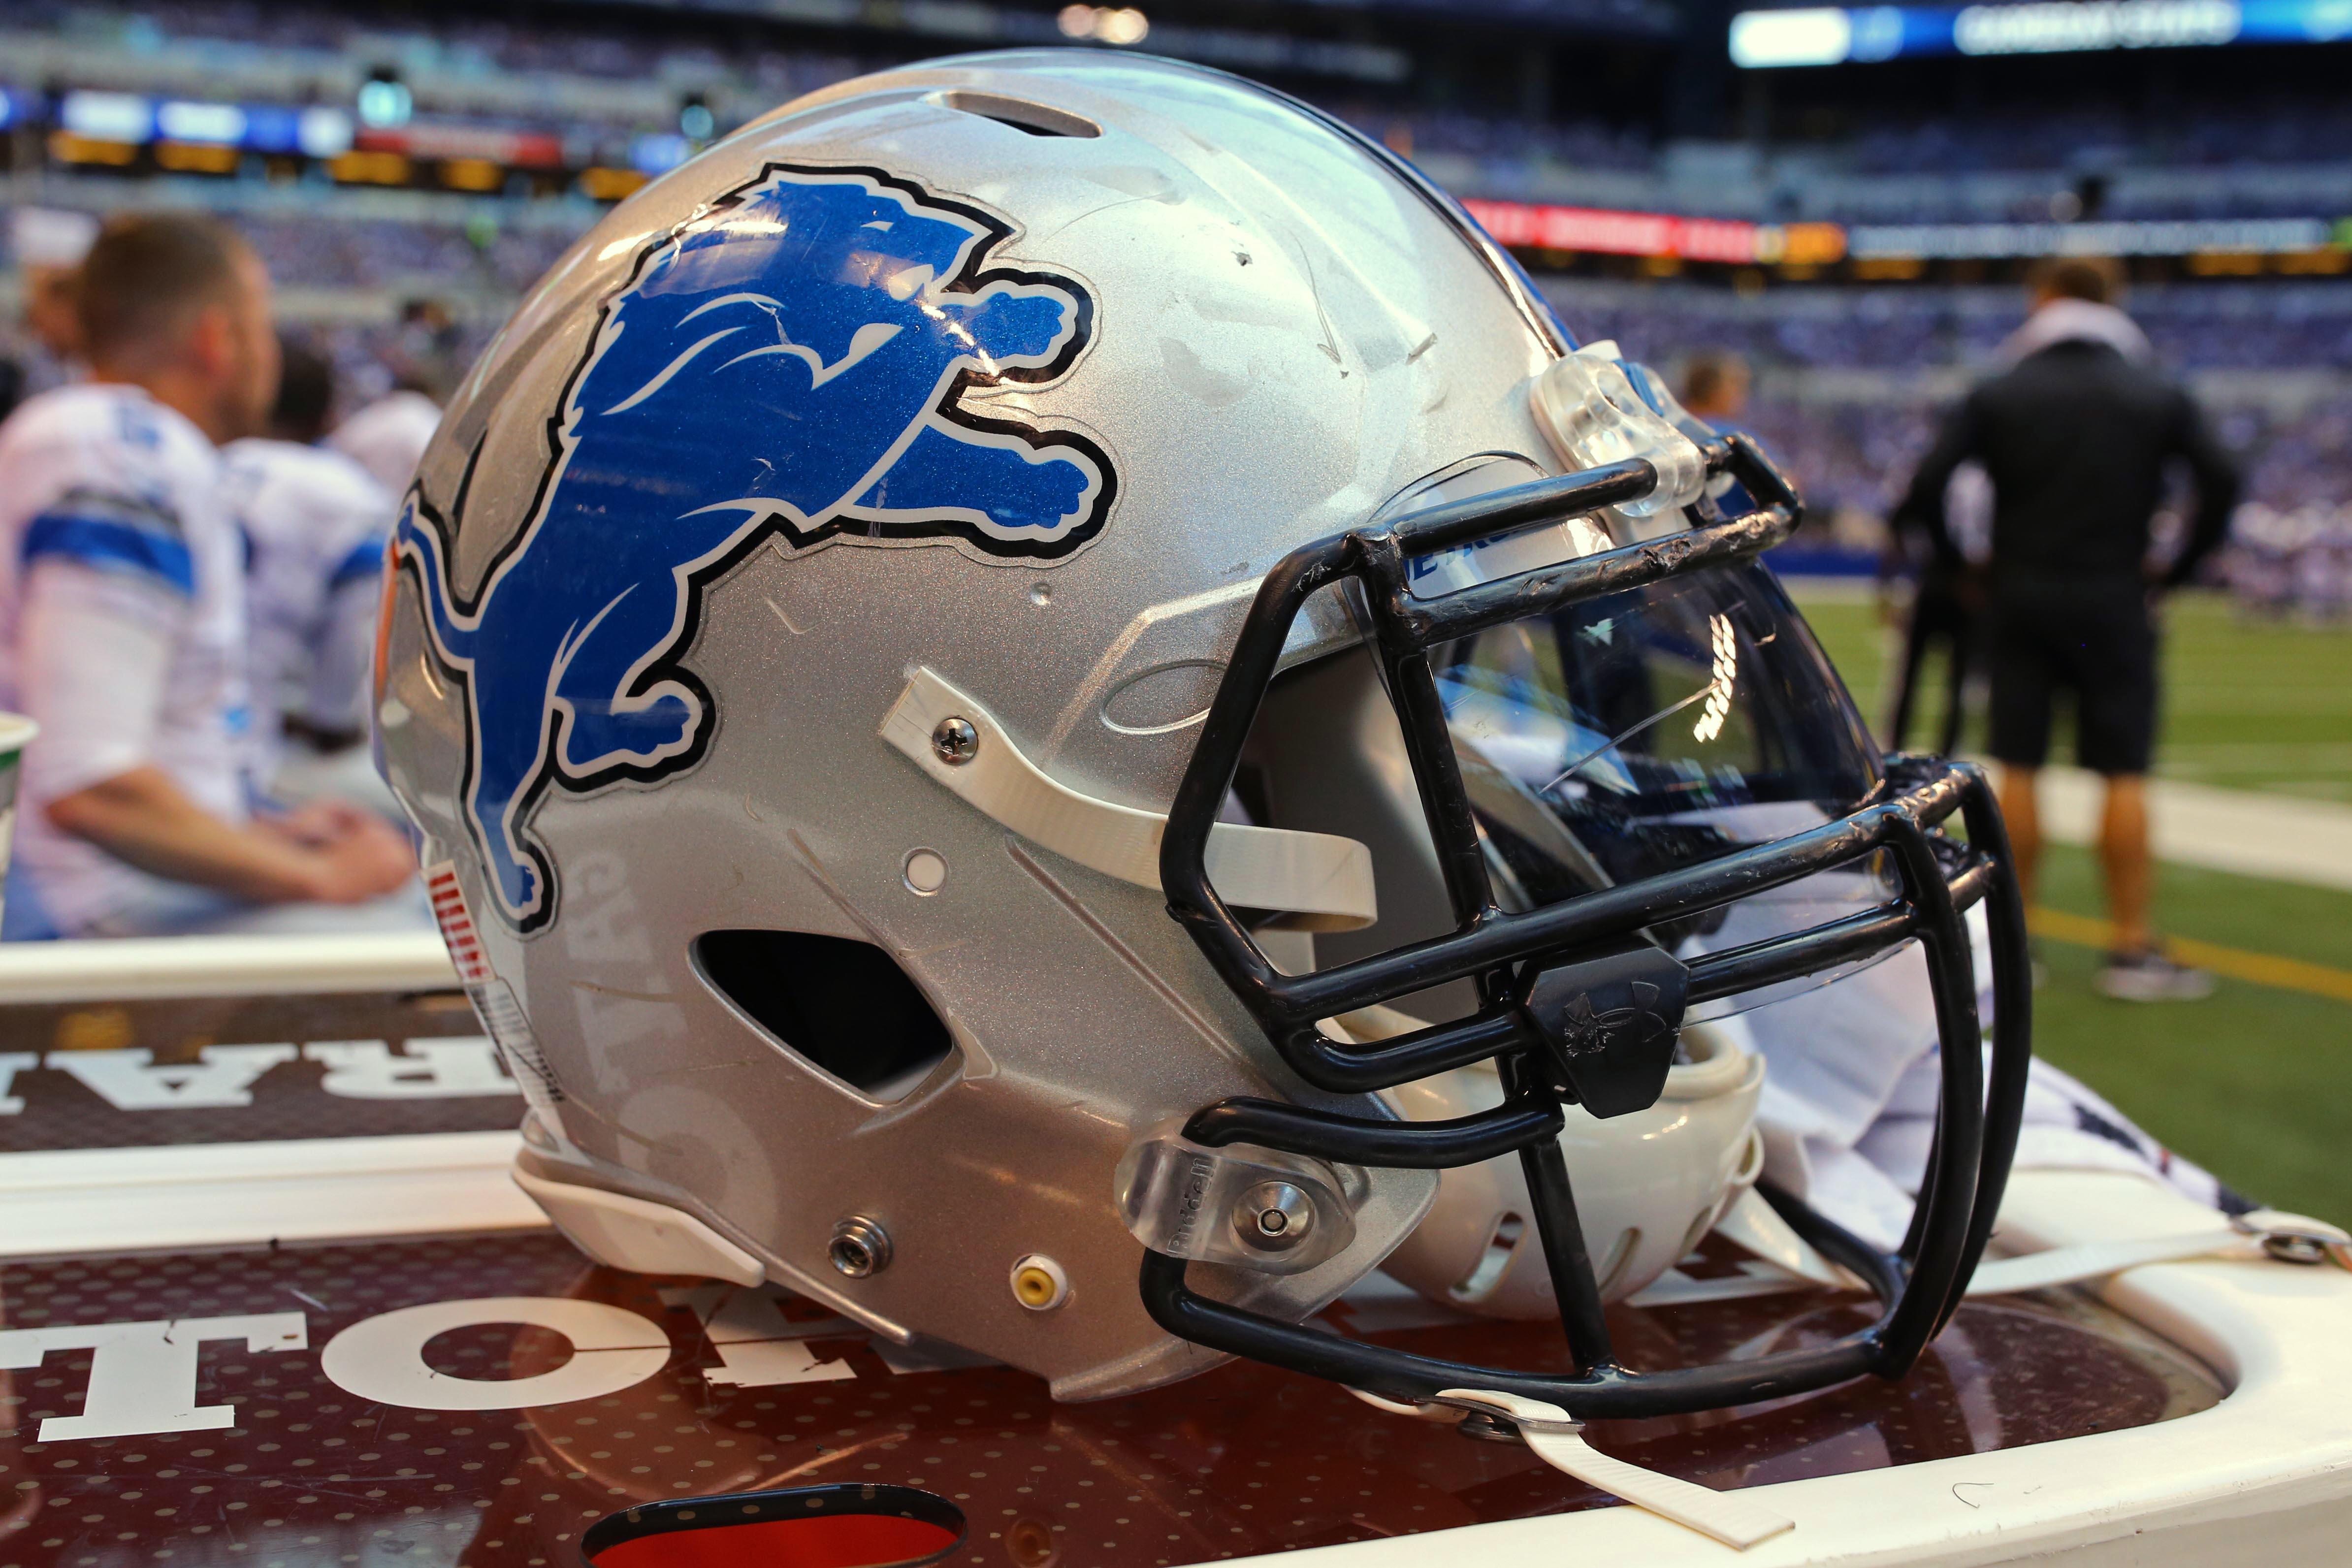 NFL: Detroit Lions at Indianapolis Colts